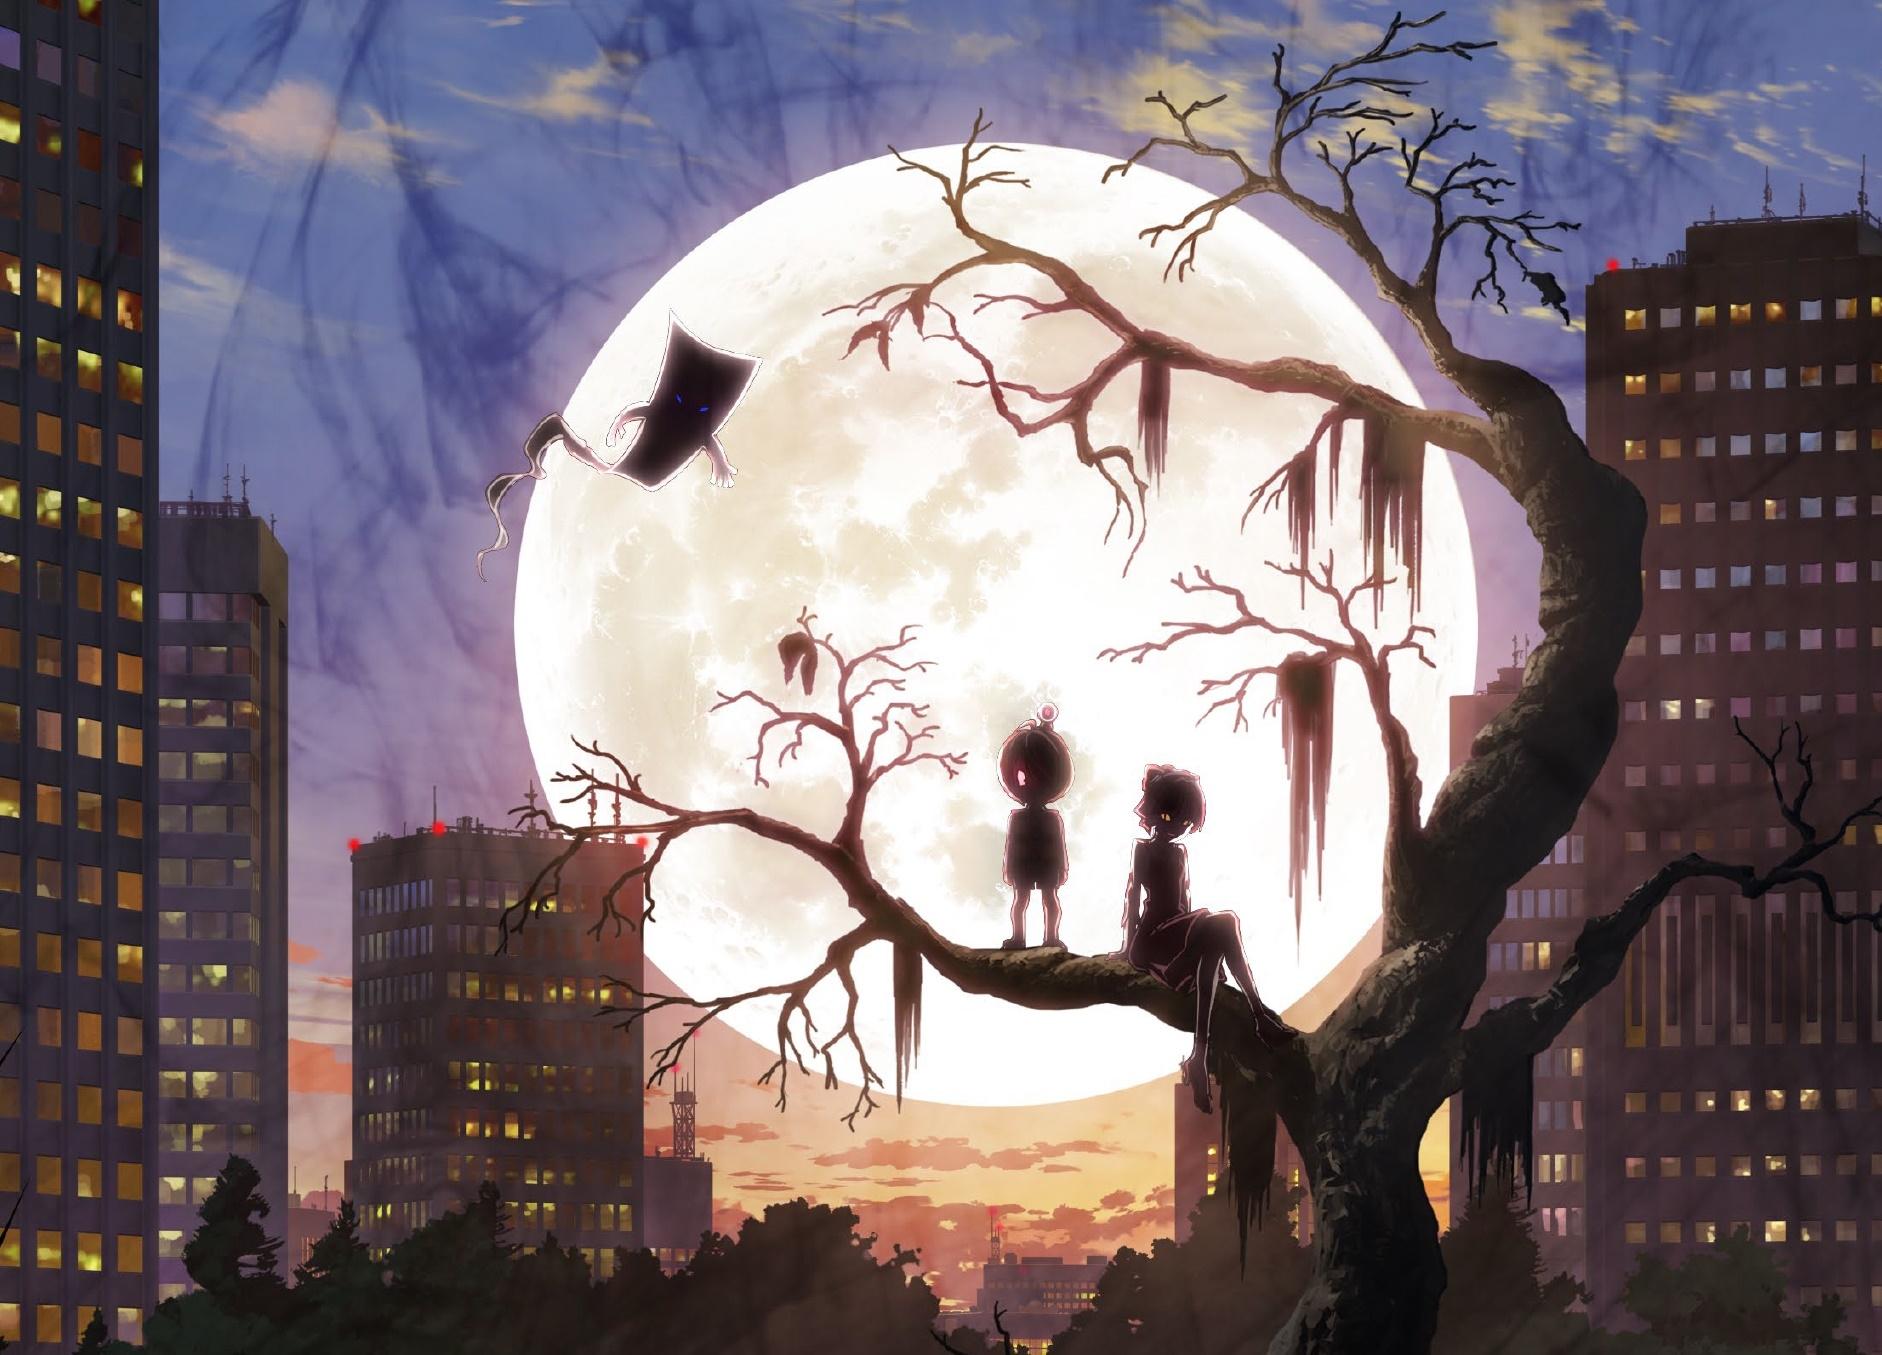 TVアニメ『ゲゲゲの鬼太郎』BD&DVD5ジャケット写真、展開図 解禁